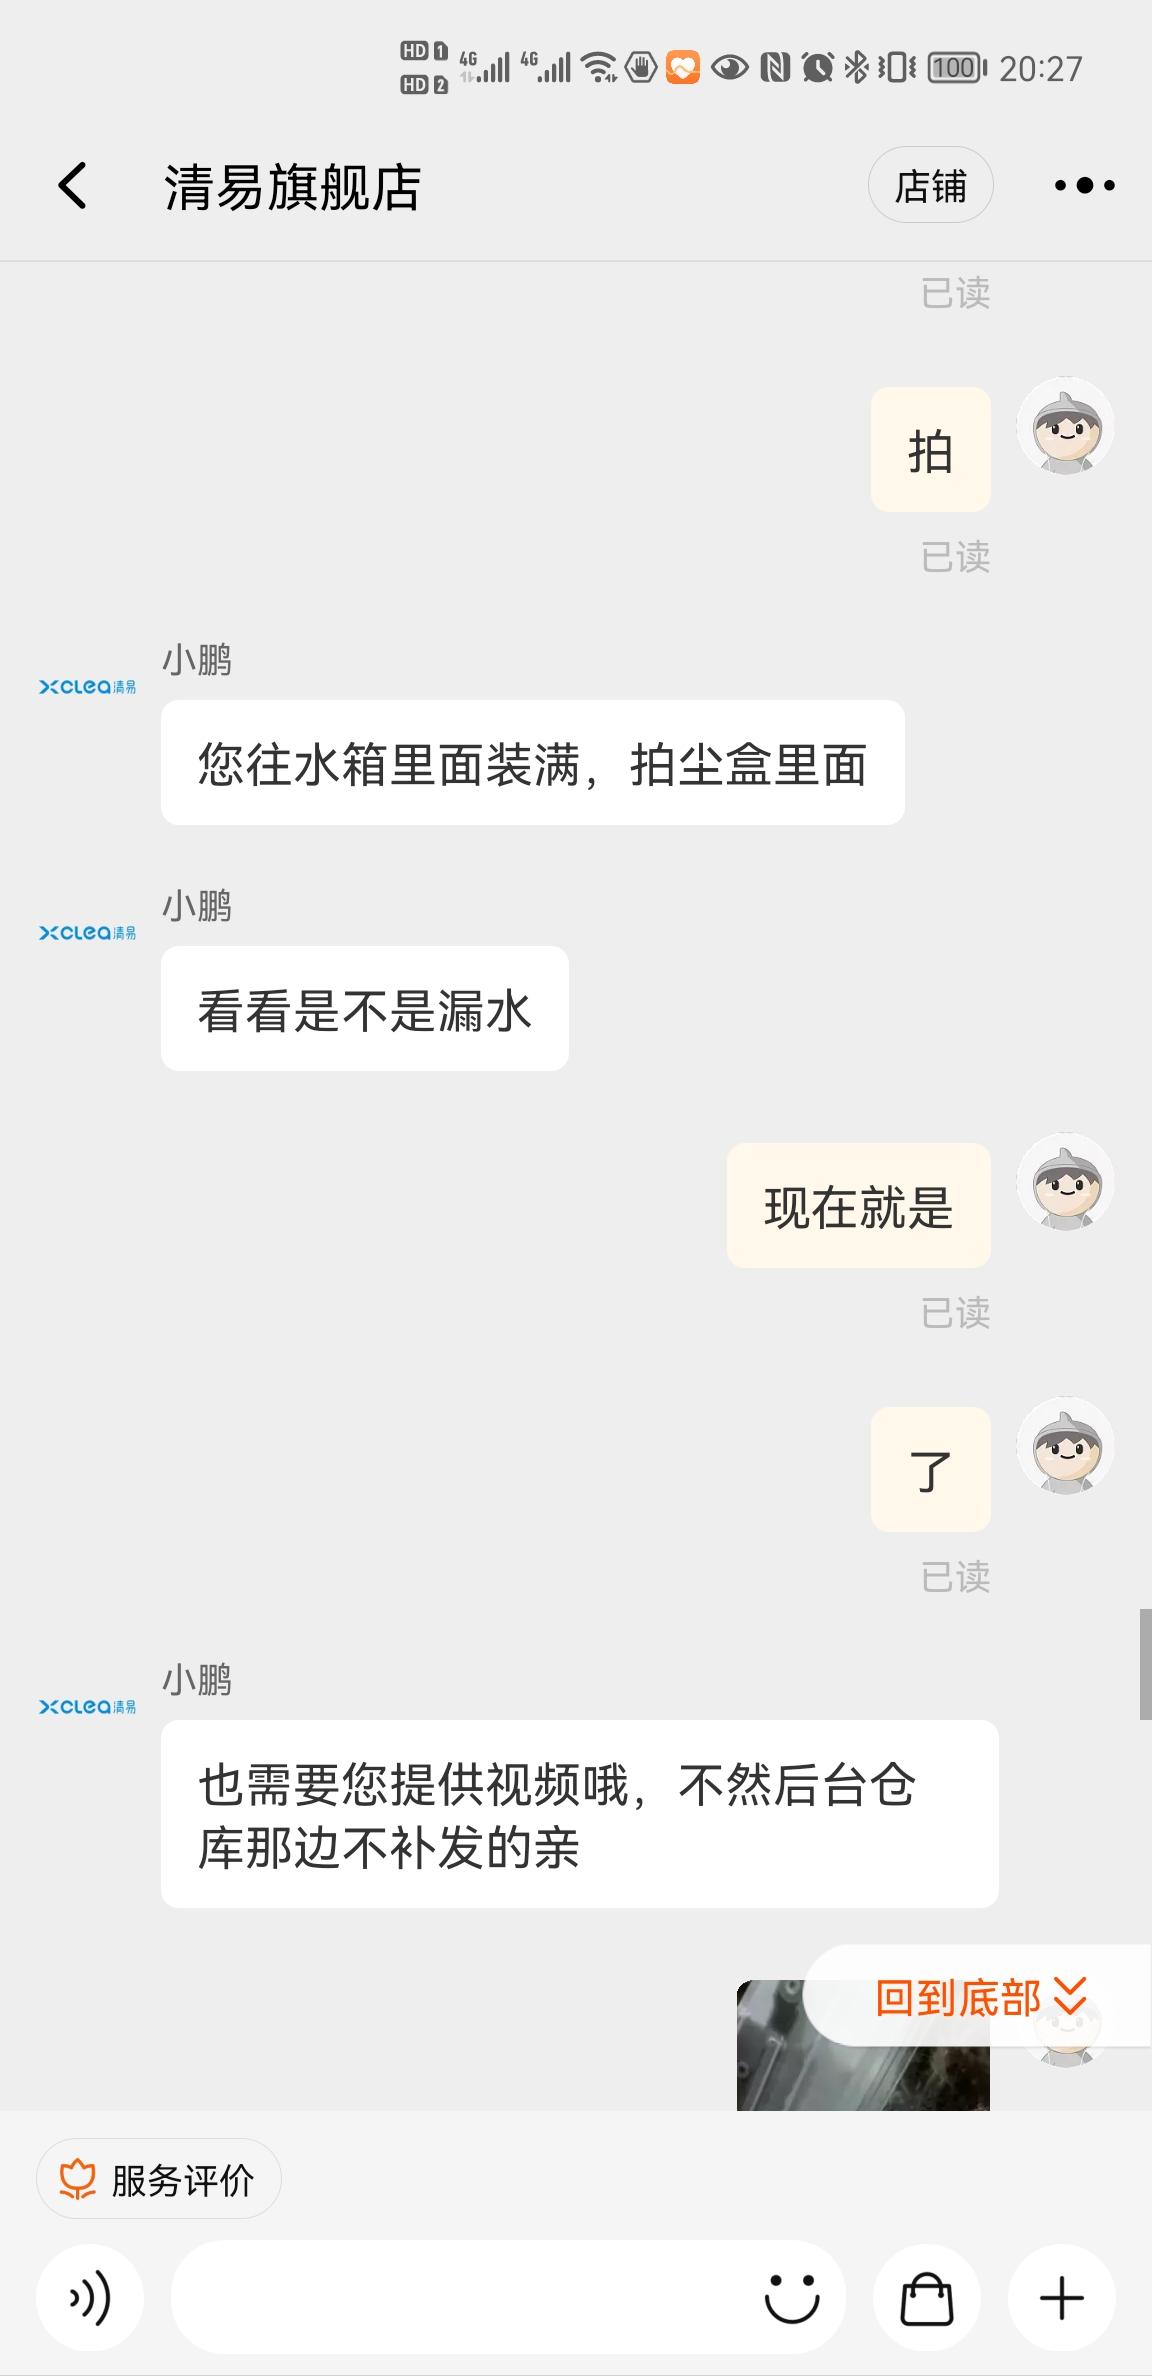 Screenshot_20210903_202751_com.taobao.taobao.jpg